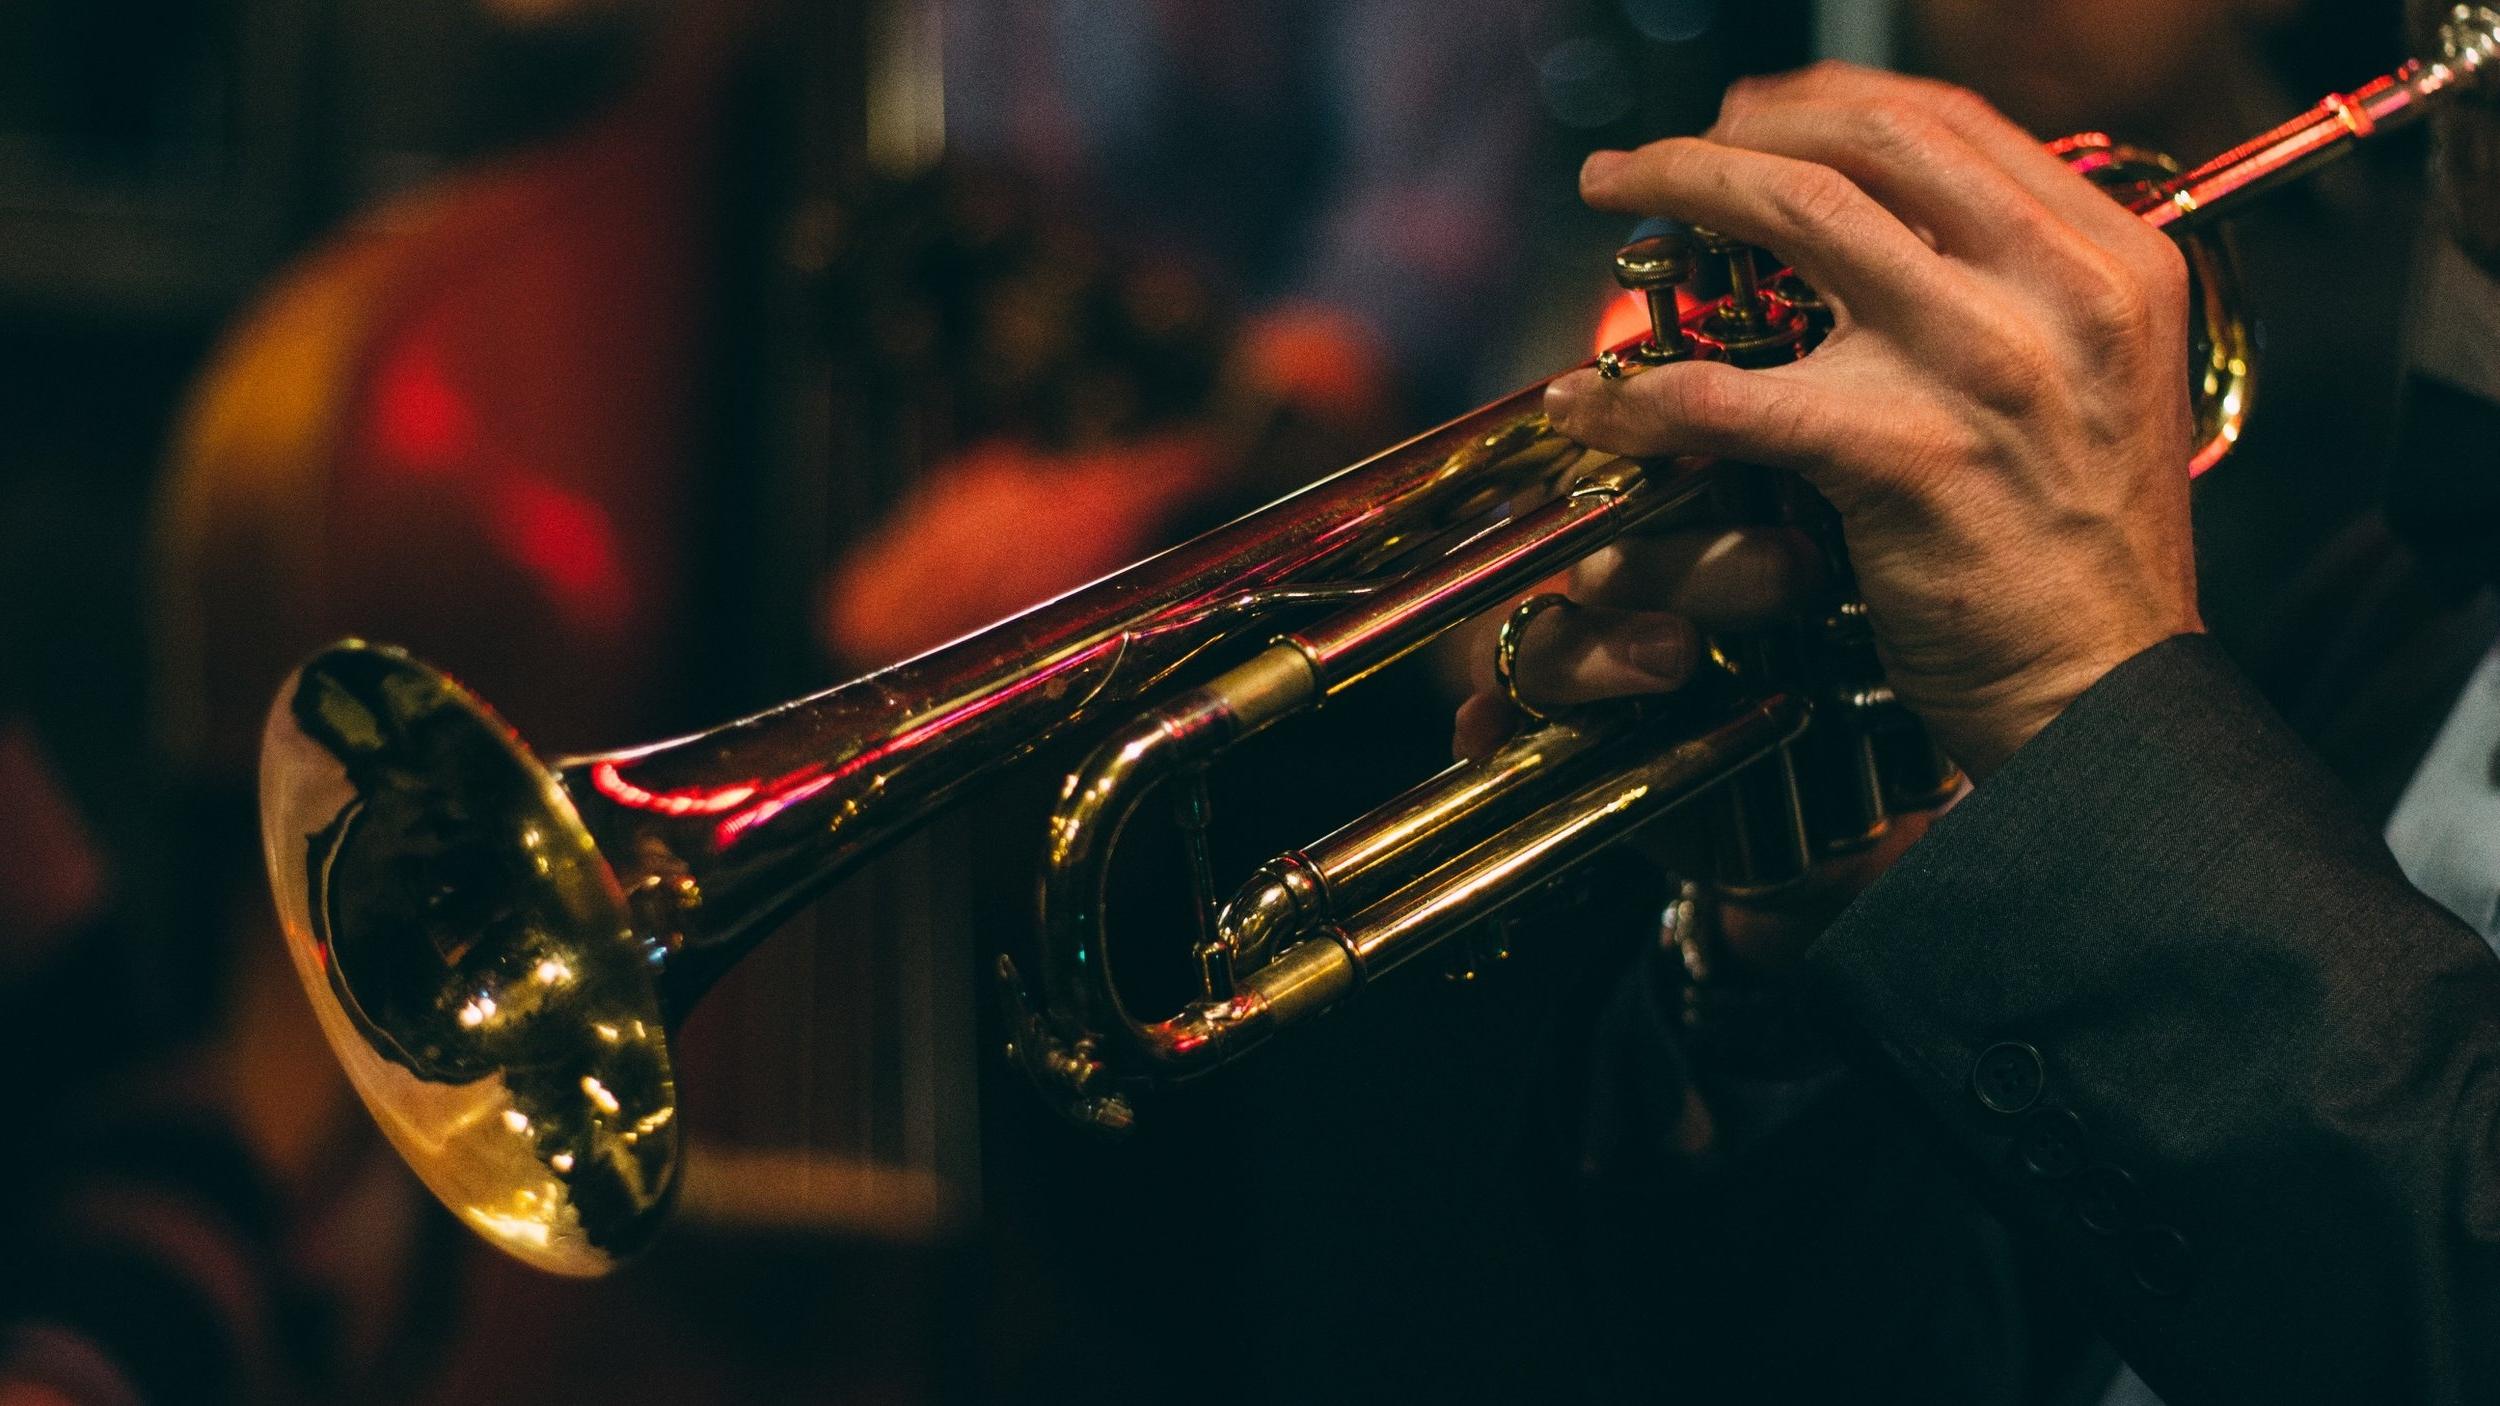 Traditional New Orlean Jazz Performances (Photo: Chris Bair)